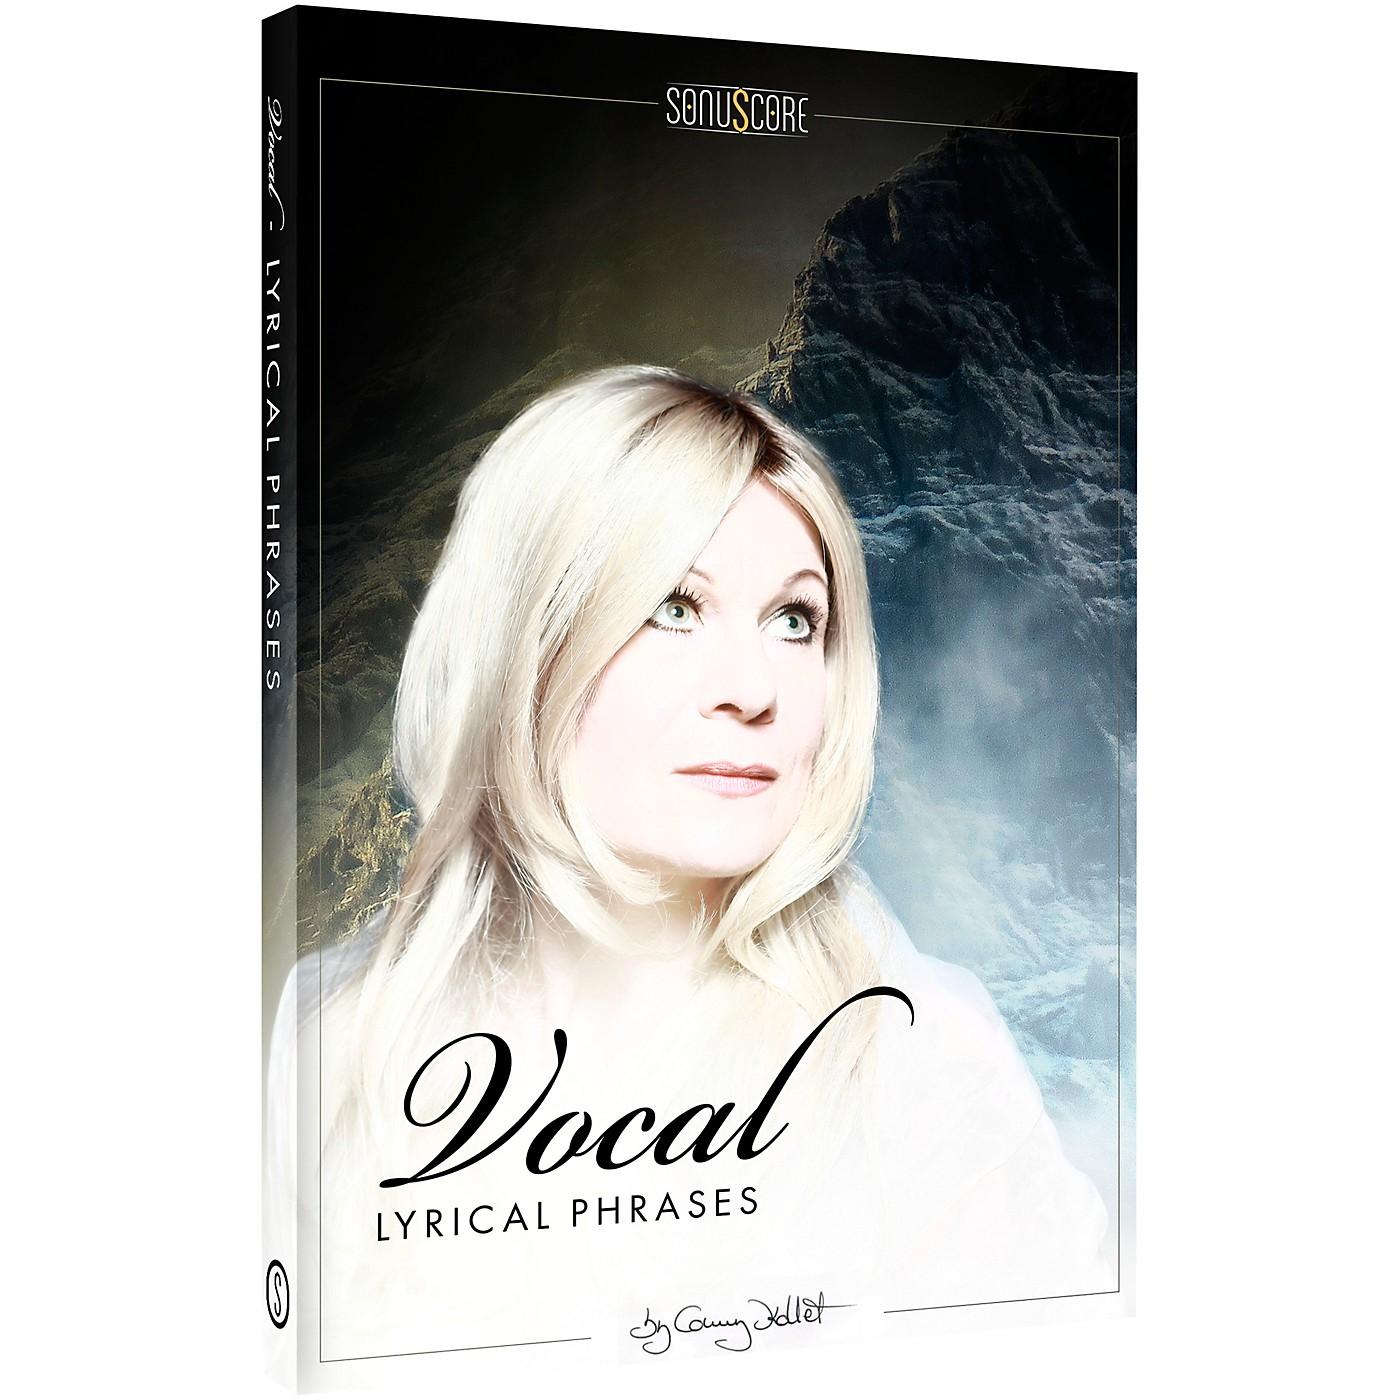 Sonuscore Lyrical Vocal Phrases thumbnail